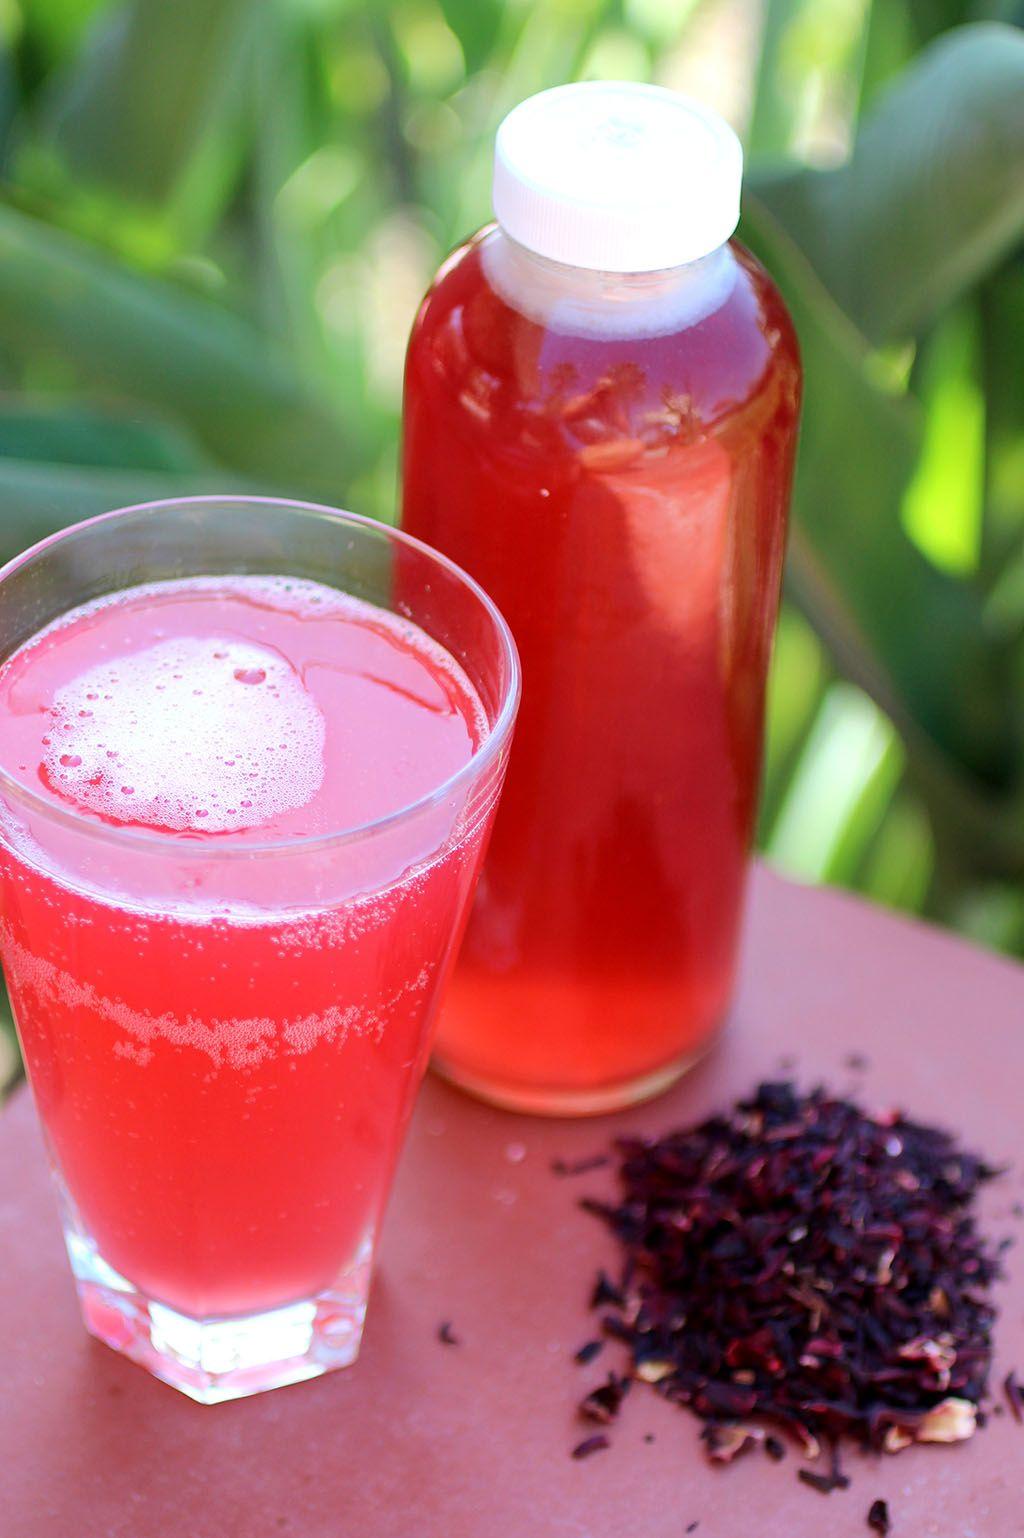 Hibiscus tea kombucha hibiscus kombucha how to use dried hibiscus petals in your first ferment cultured food life izmirmasajfo